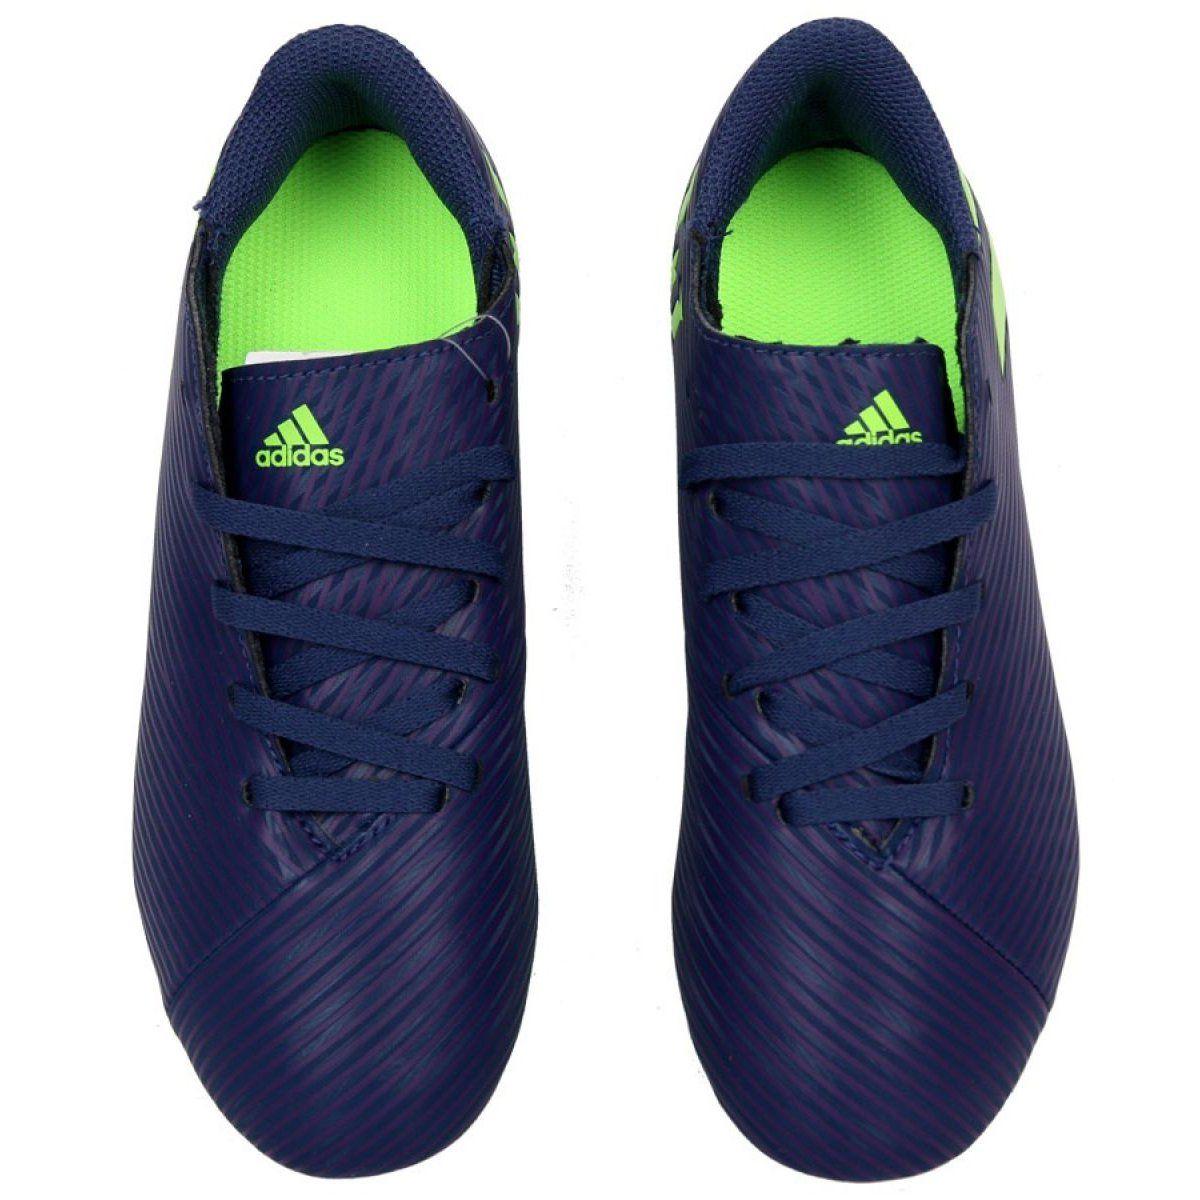 Buty Adidas Nemeziz Messi 19 4 Fg Jr Ef1816 Fioletowe Fioletowe Adidas Sneakers Adidas Shoes